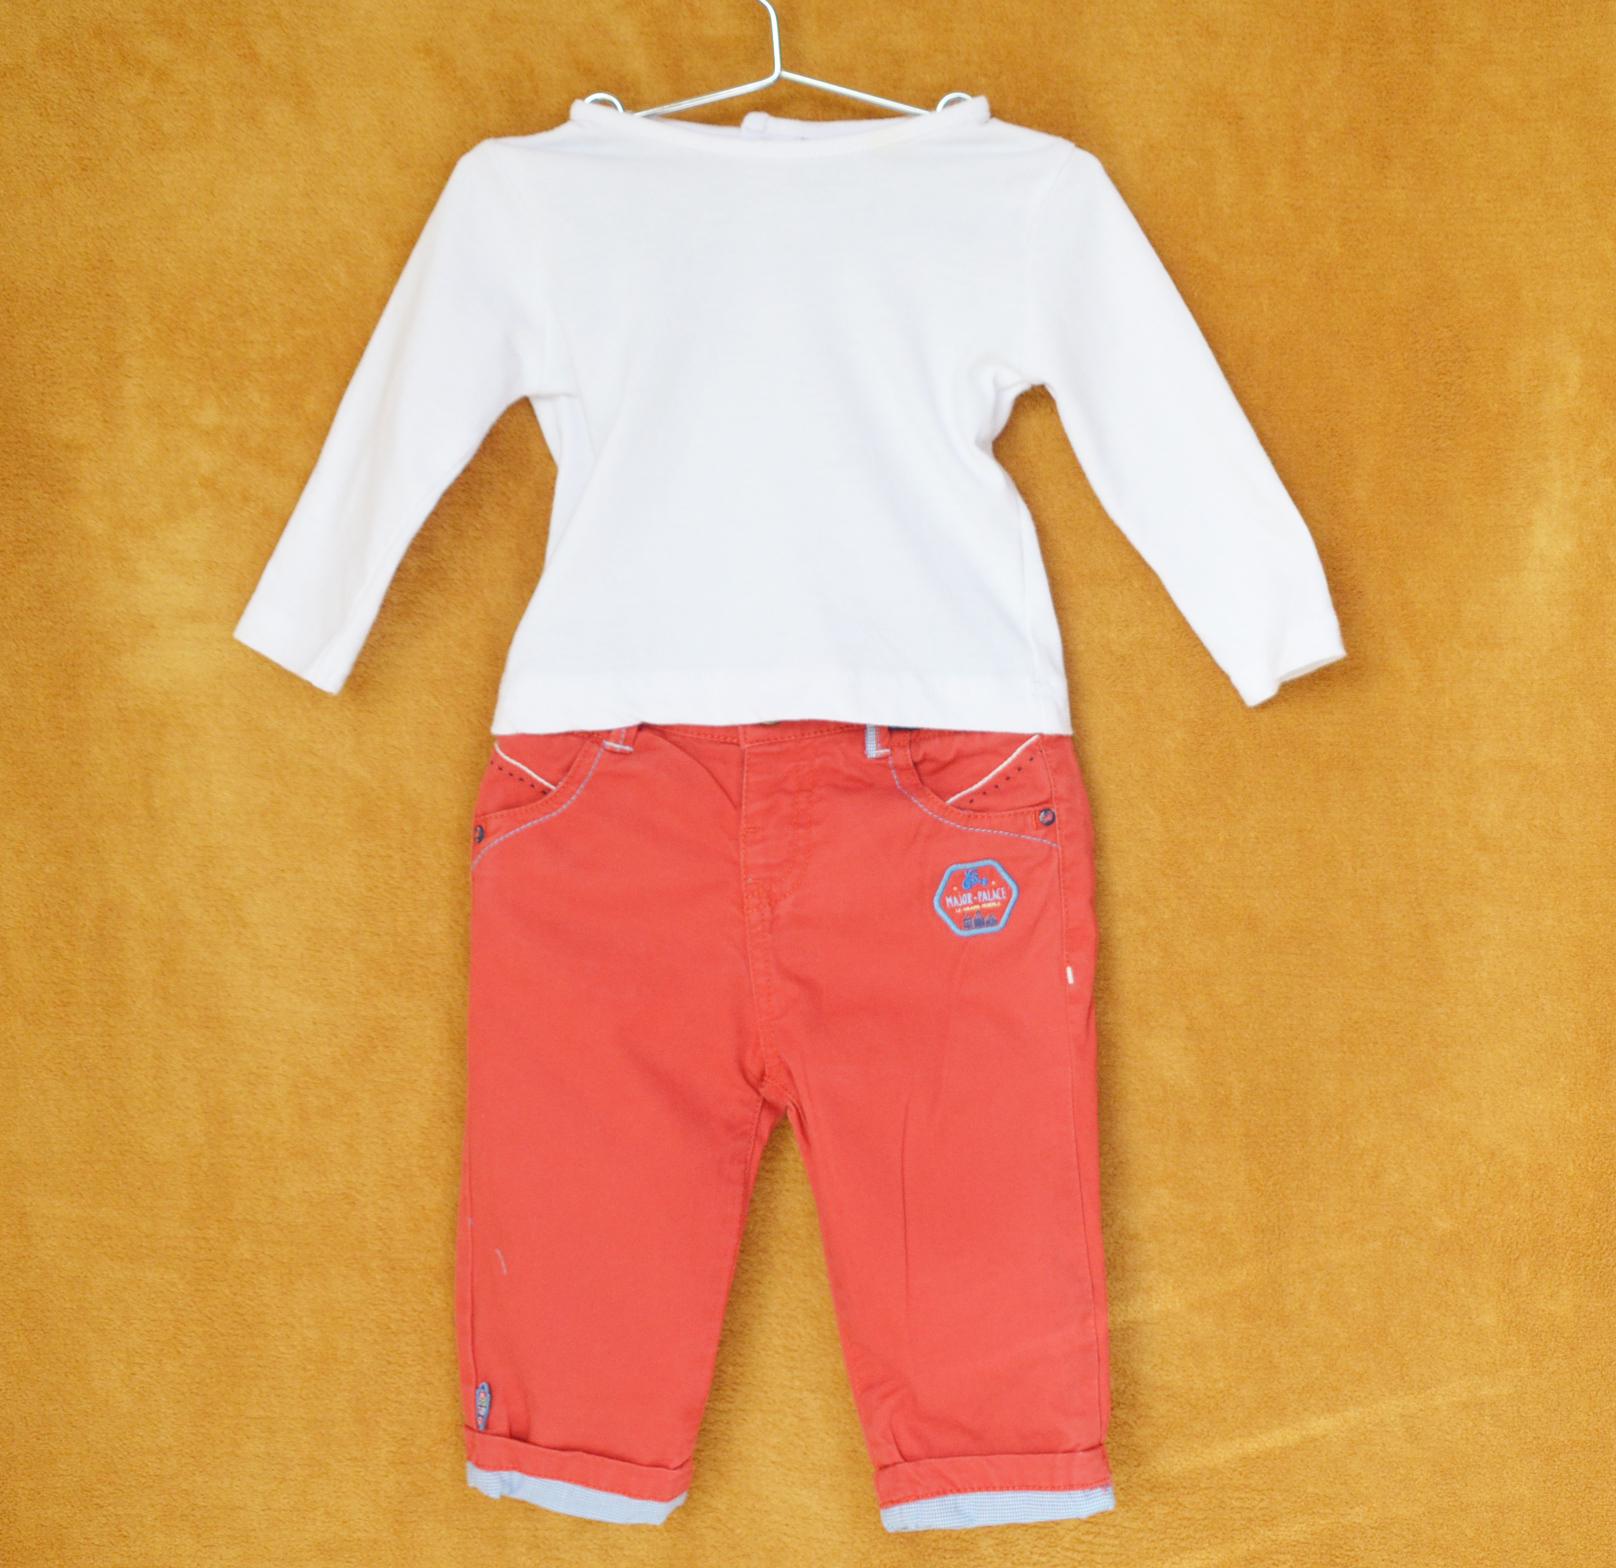 Ensemble Pantalon Rouge - Tee-shirt Blanc - Sergent Major - 6M